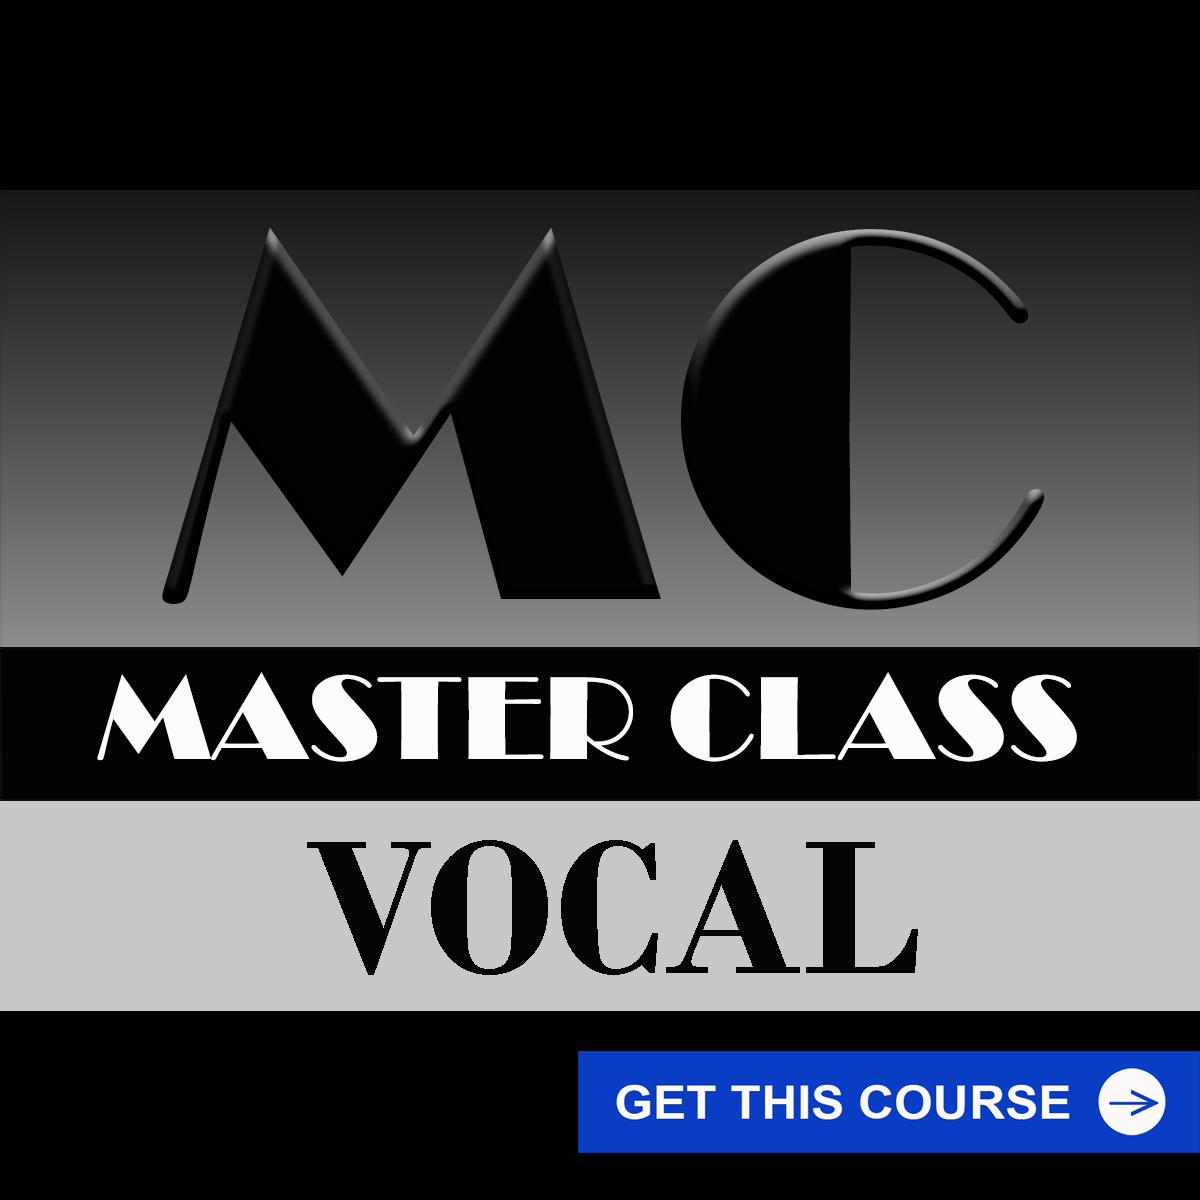 MASTER CLASS - VOCAL COURSE